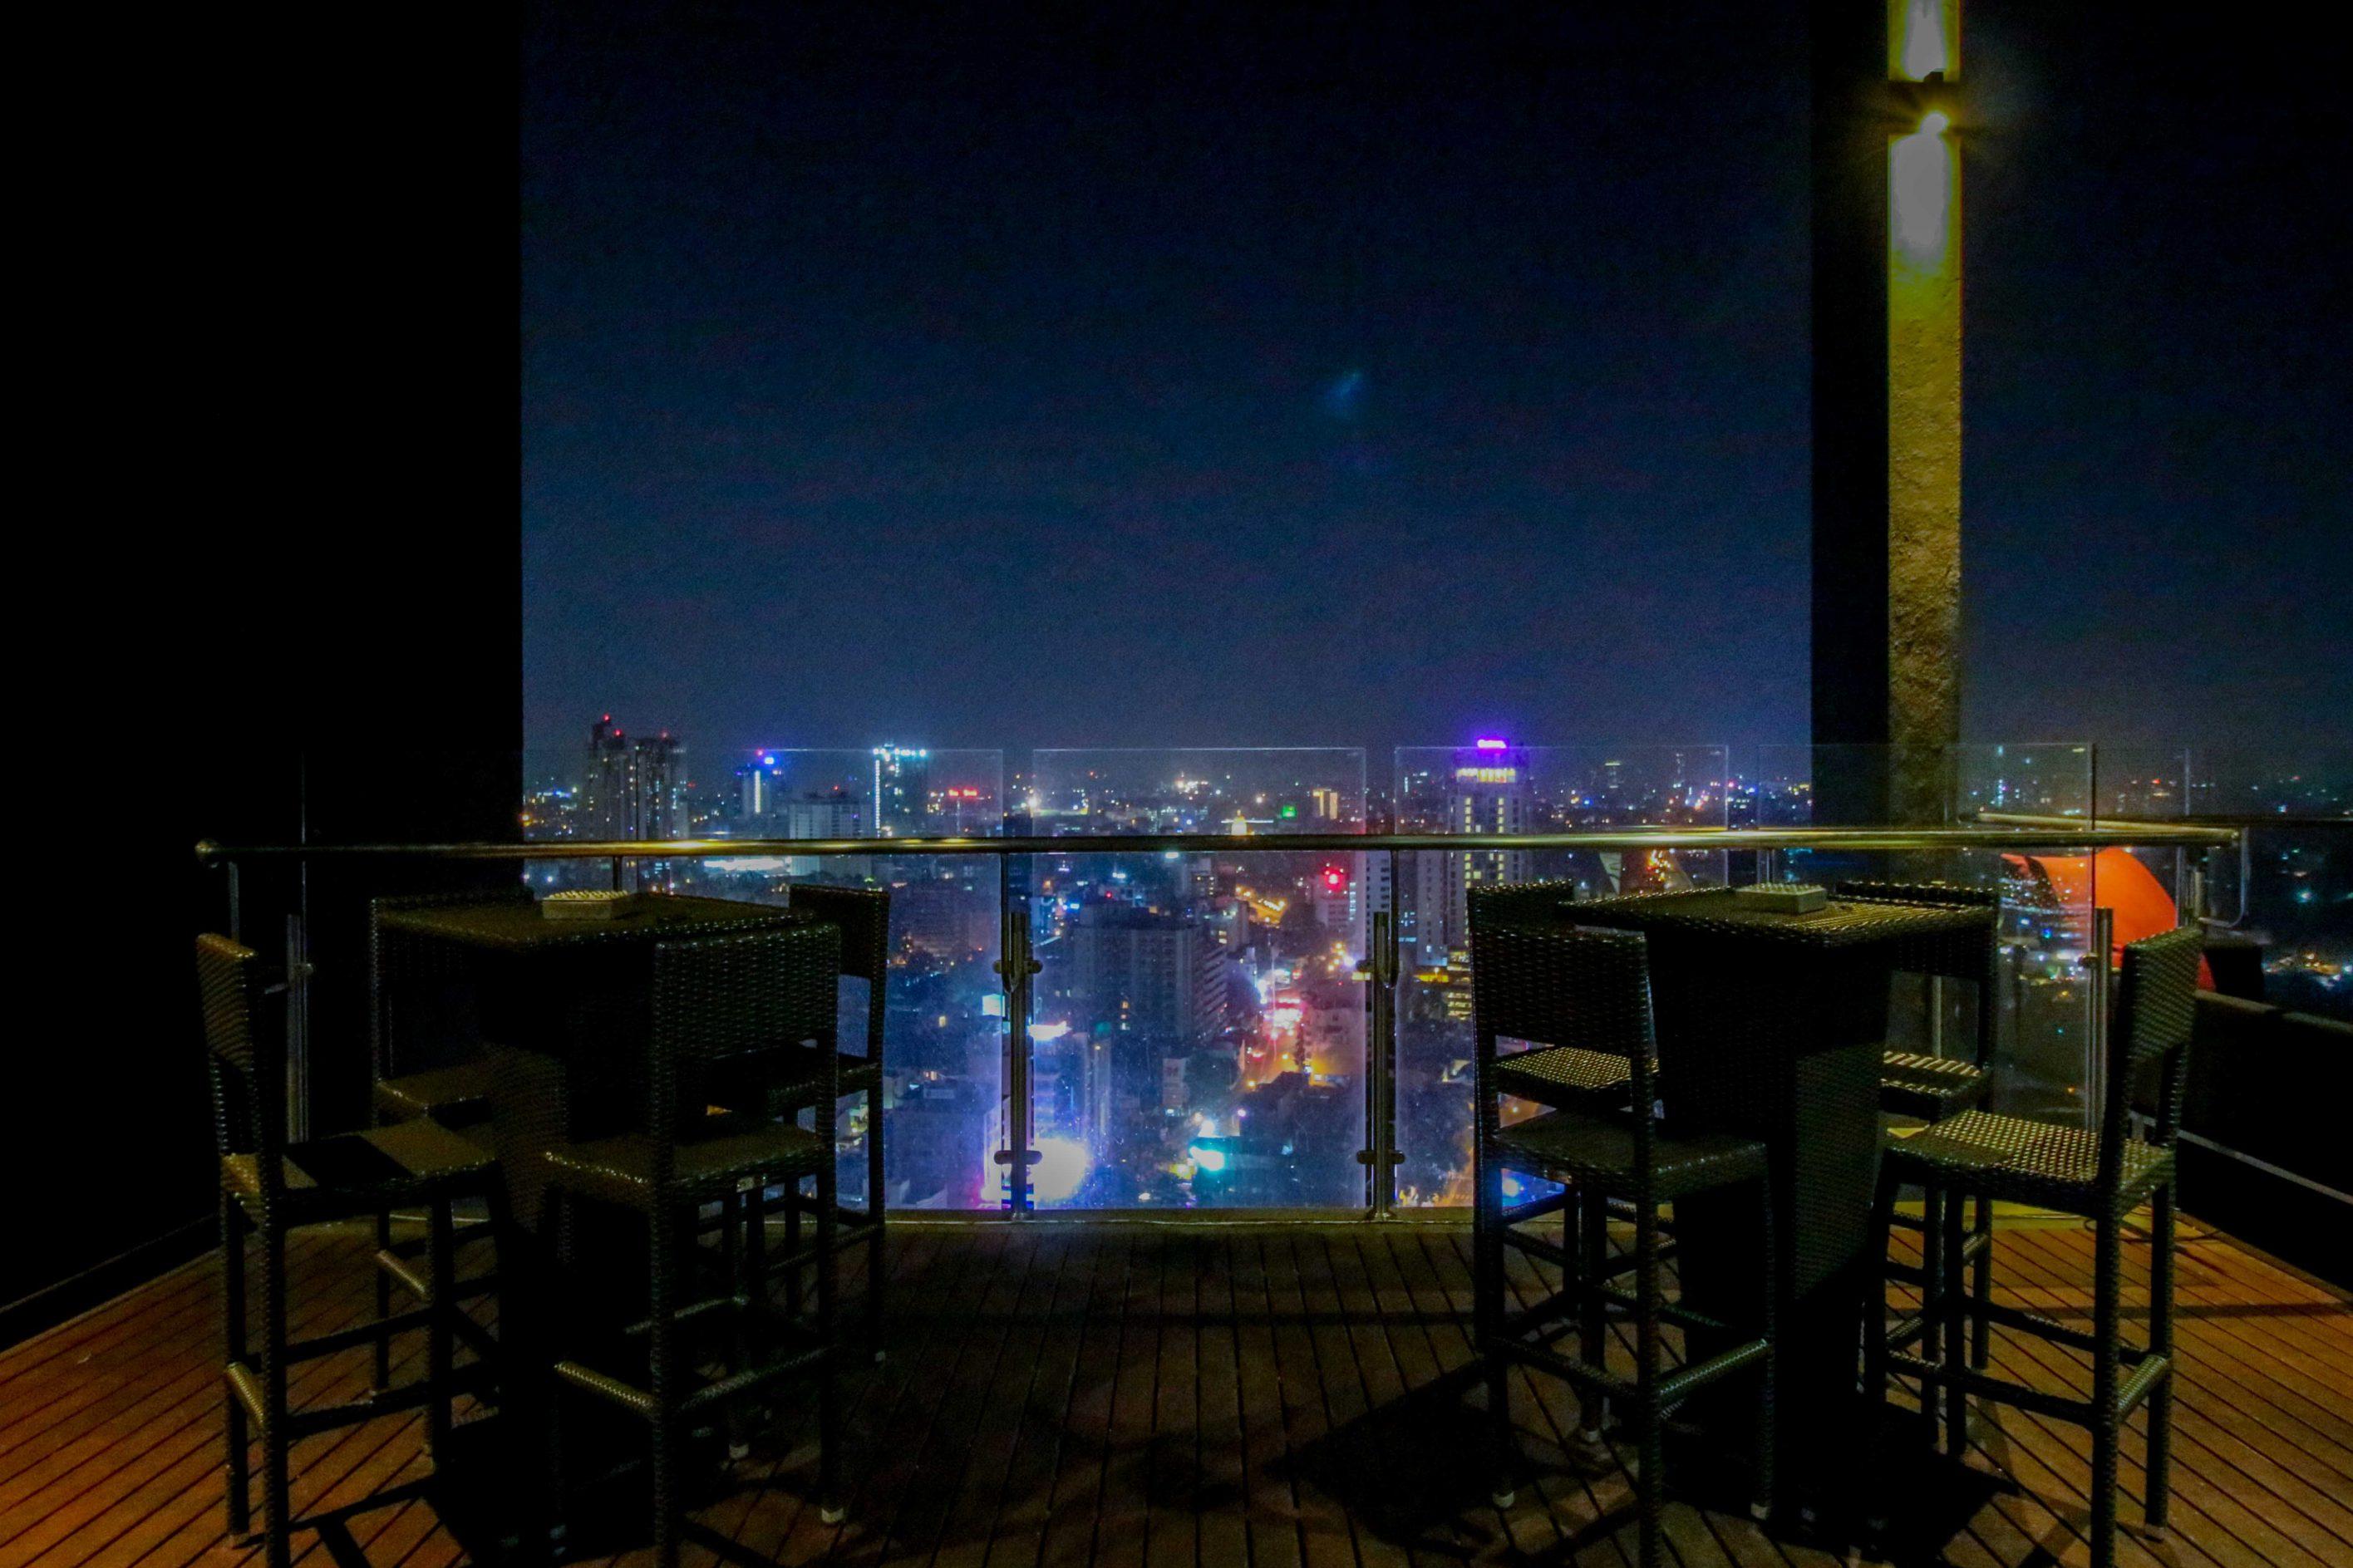 Rooftop Bar Colombo Skyline Mövenpick Colombo Hotel Reiseblog Brinisfashionbook bestes Hotel Sri Lanka 2